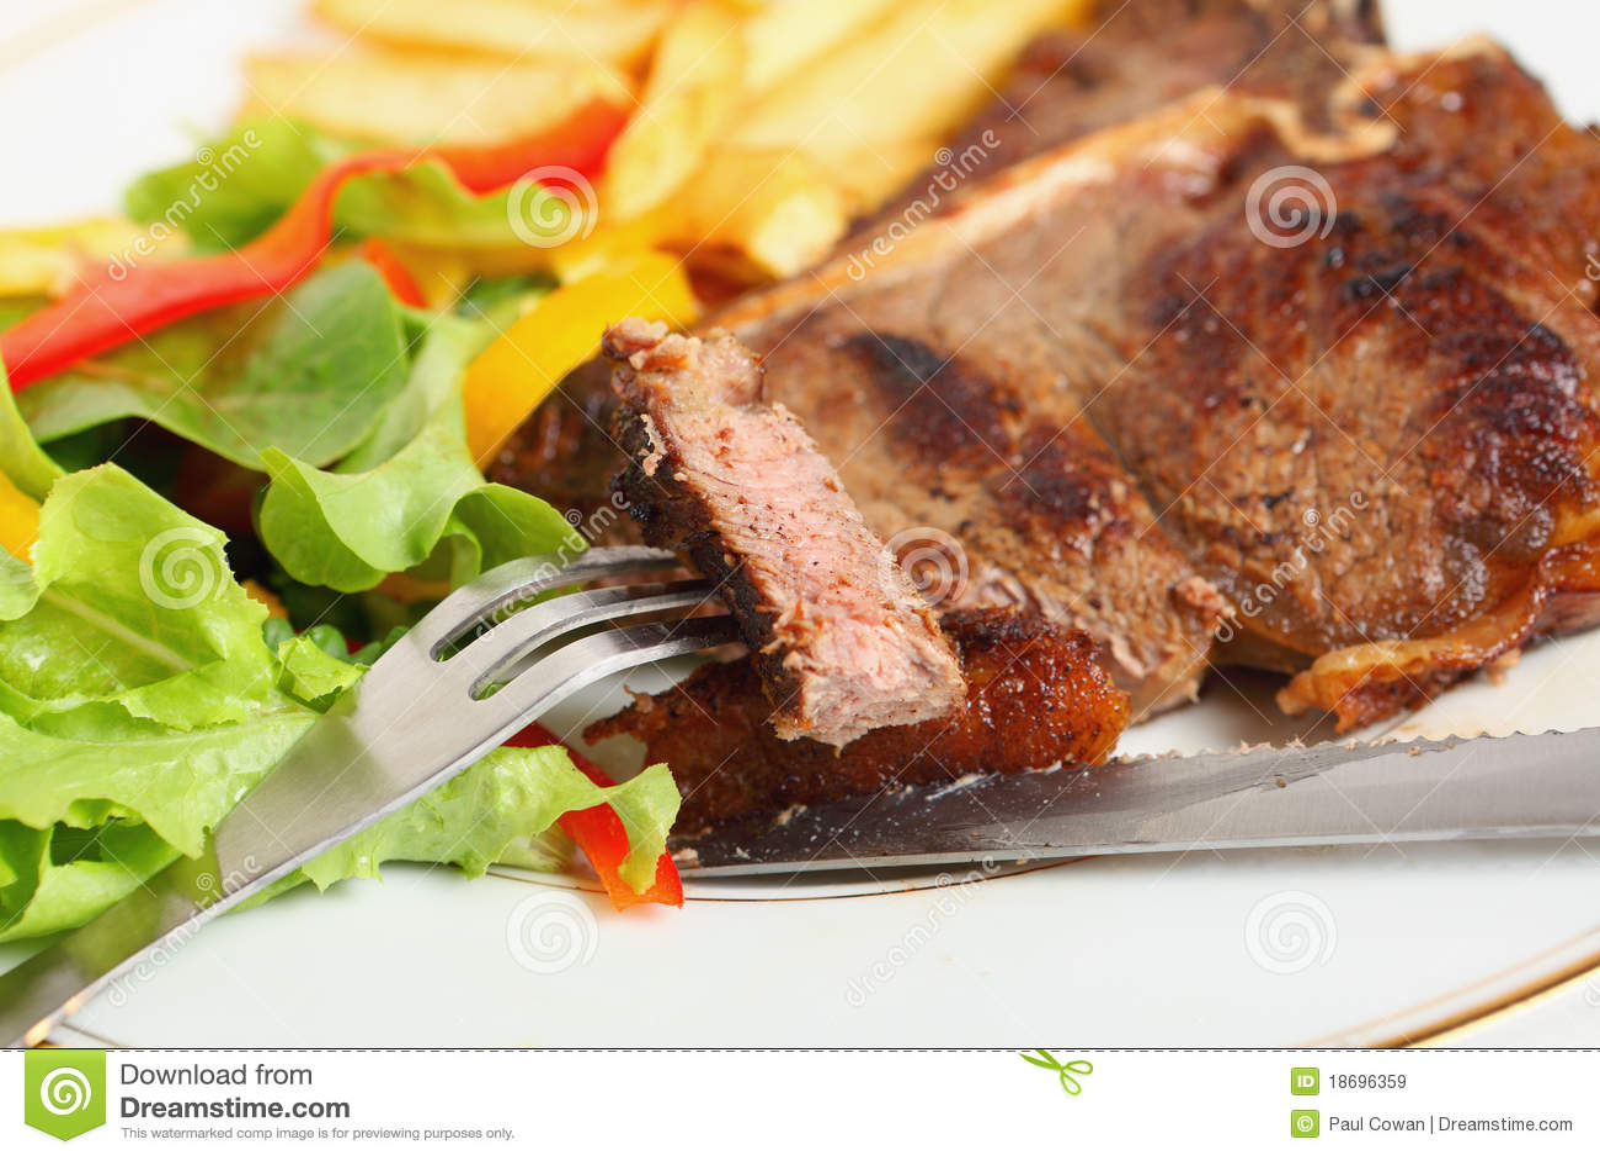 Forum on this topic: Porterhouse Steak with Grilled Salad, porterhouse-steak-with-grilled-salad/